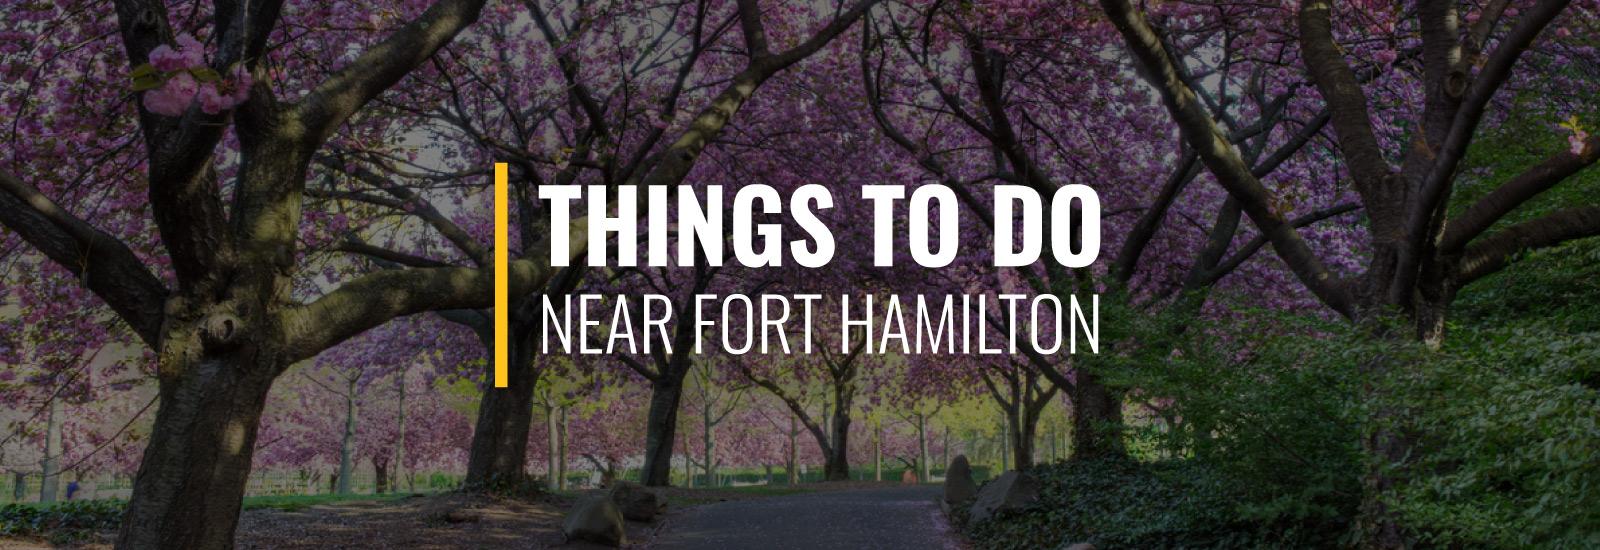 Things to Do Near Fort Hamilton